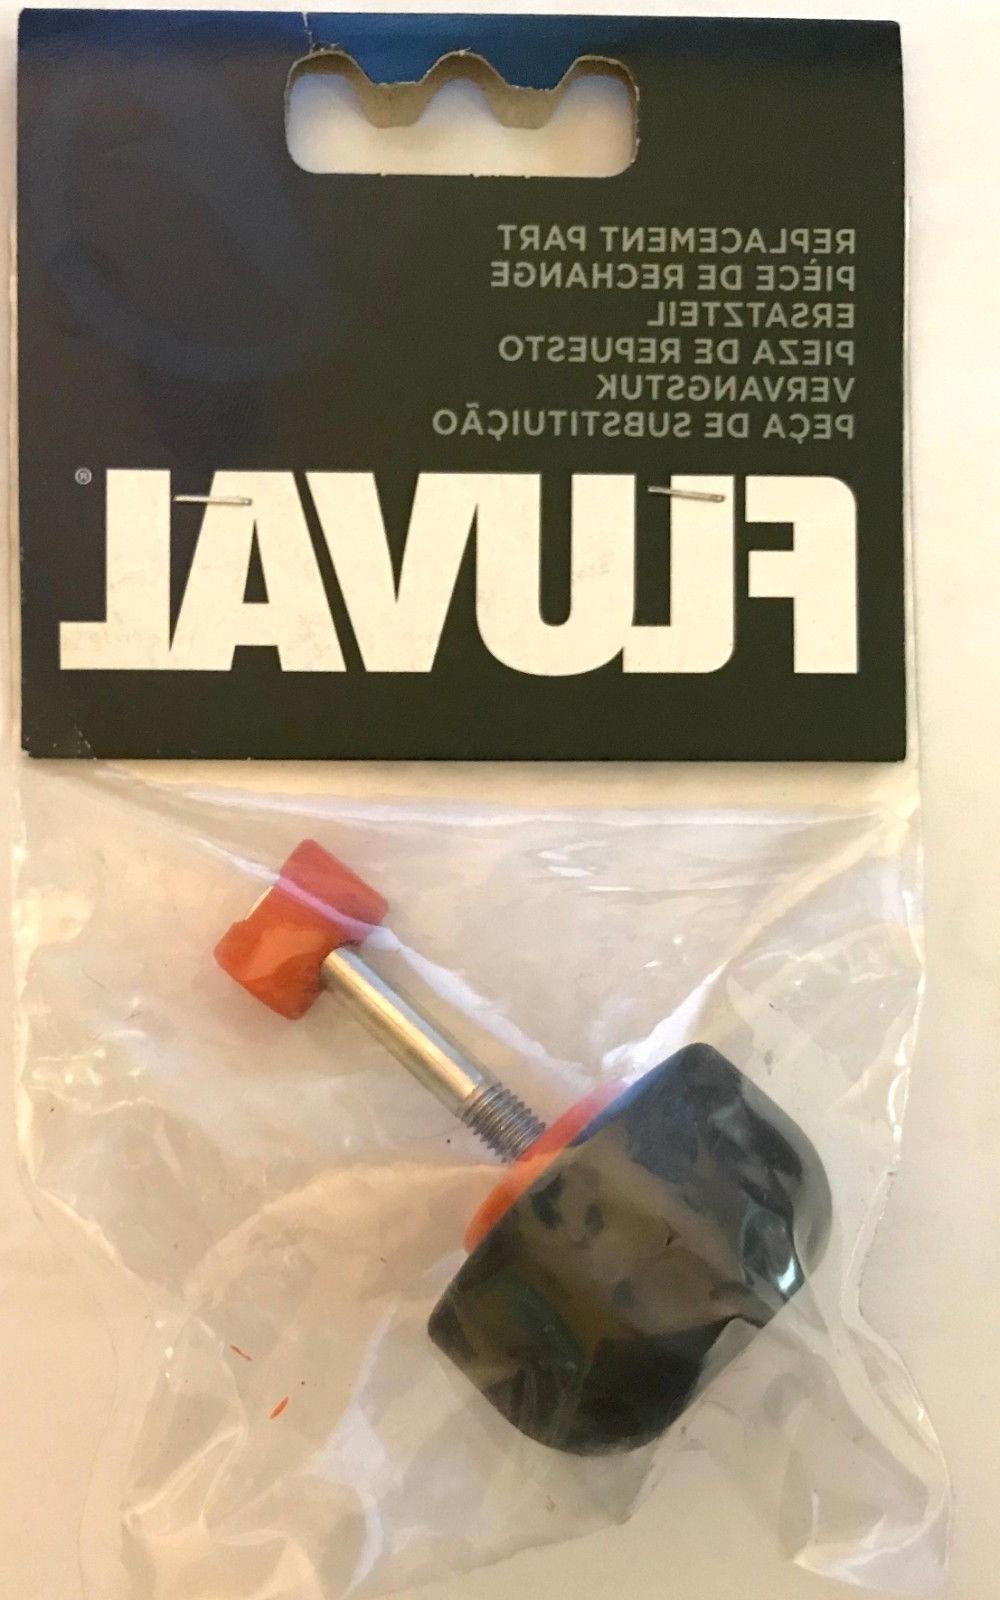 fx5 lid fastener genuine replacement part keeps